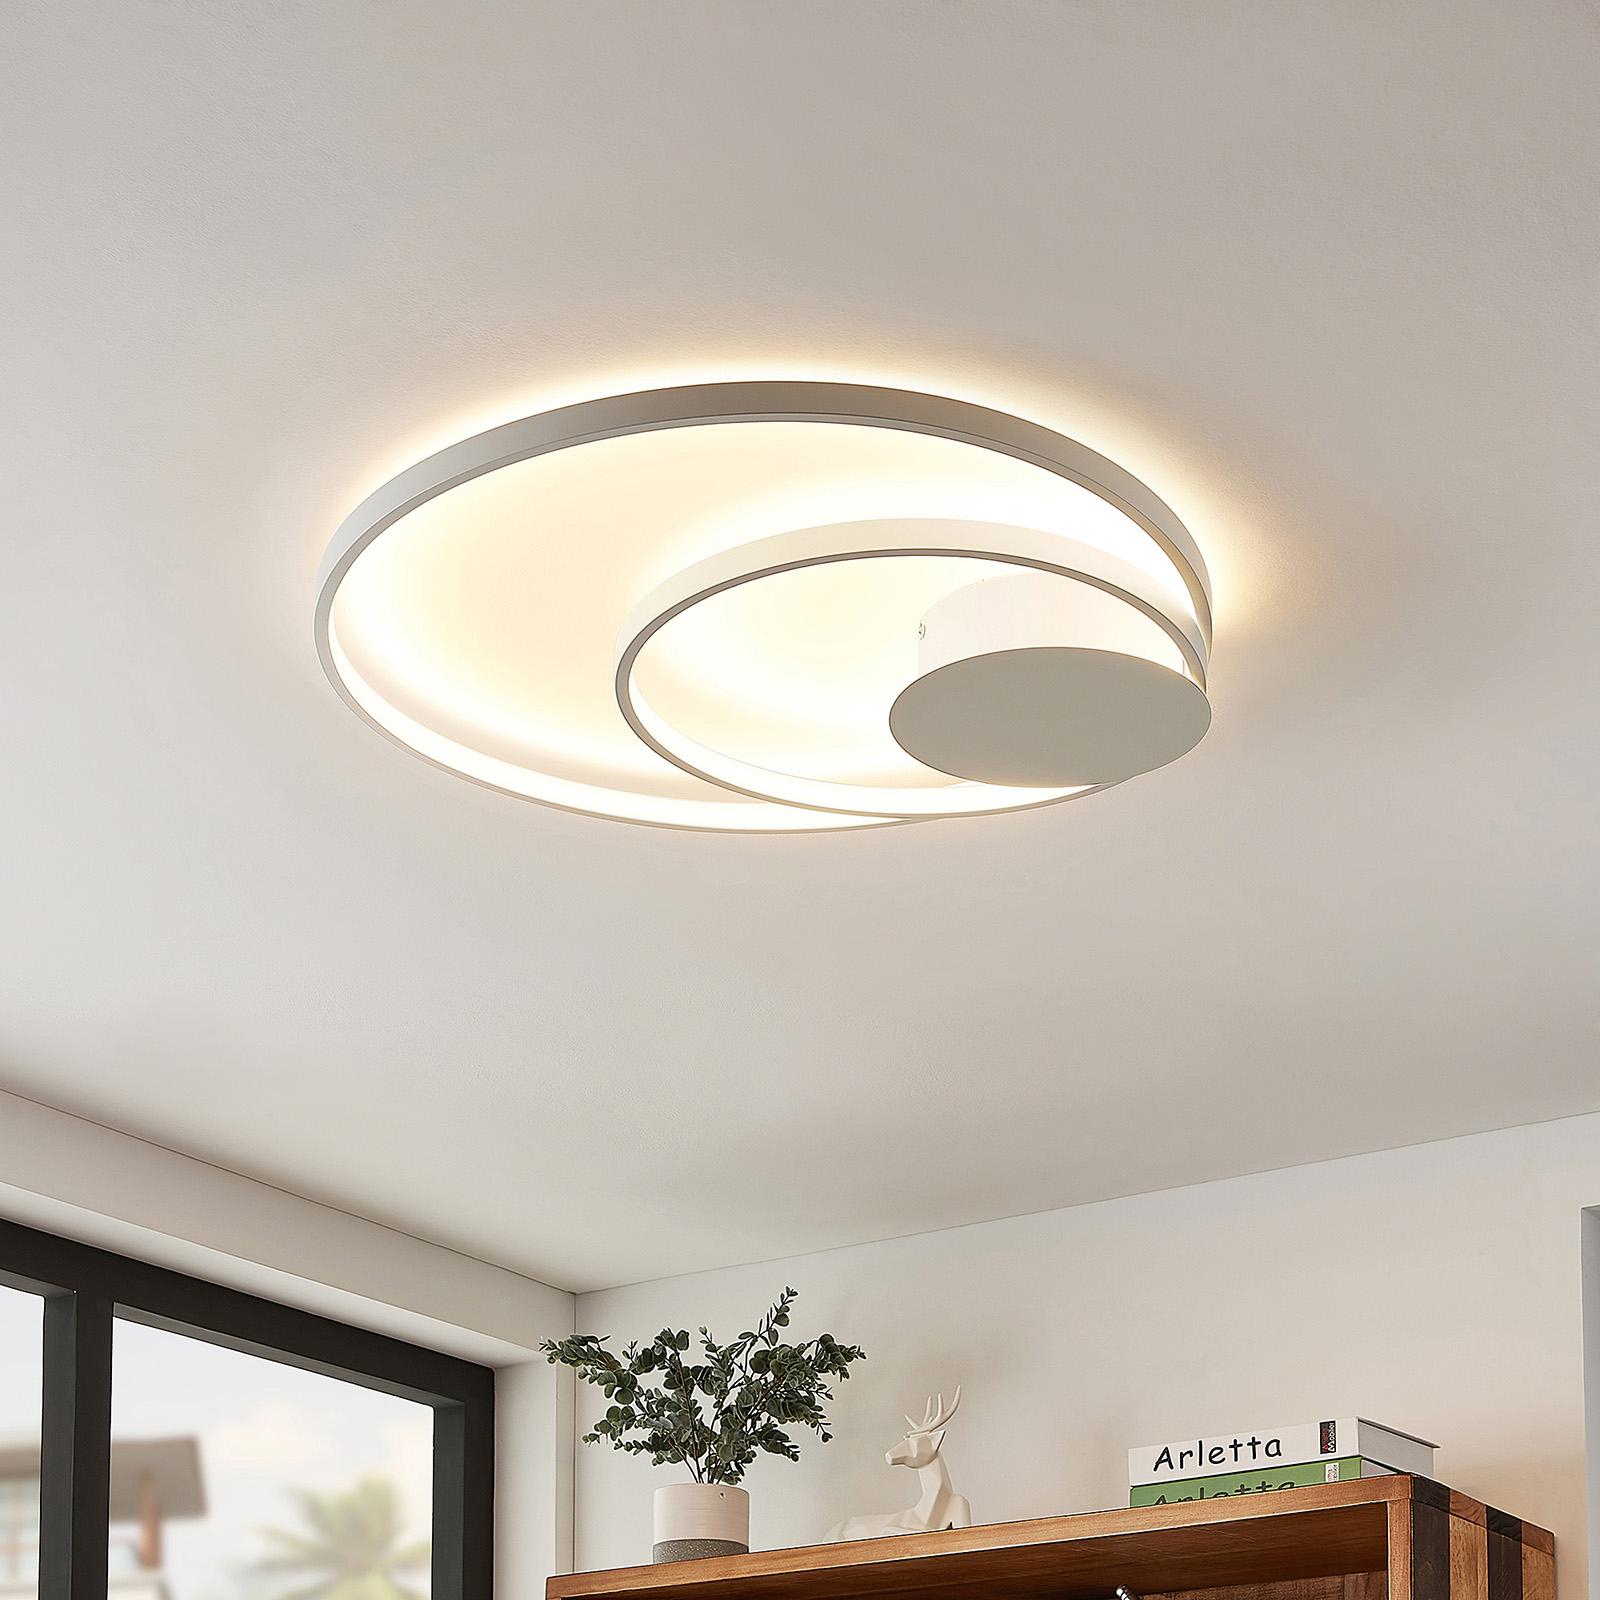 Lindby Nerwin LED-loftlampe, rund, hvid